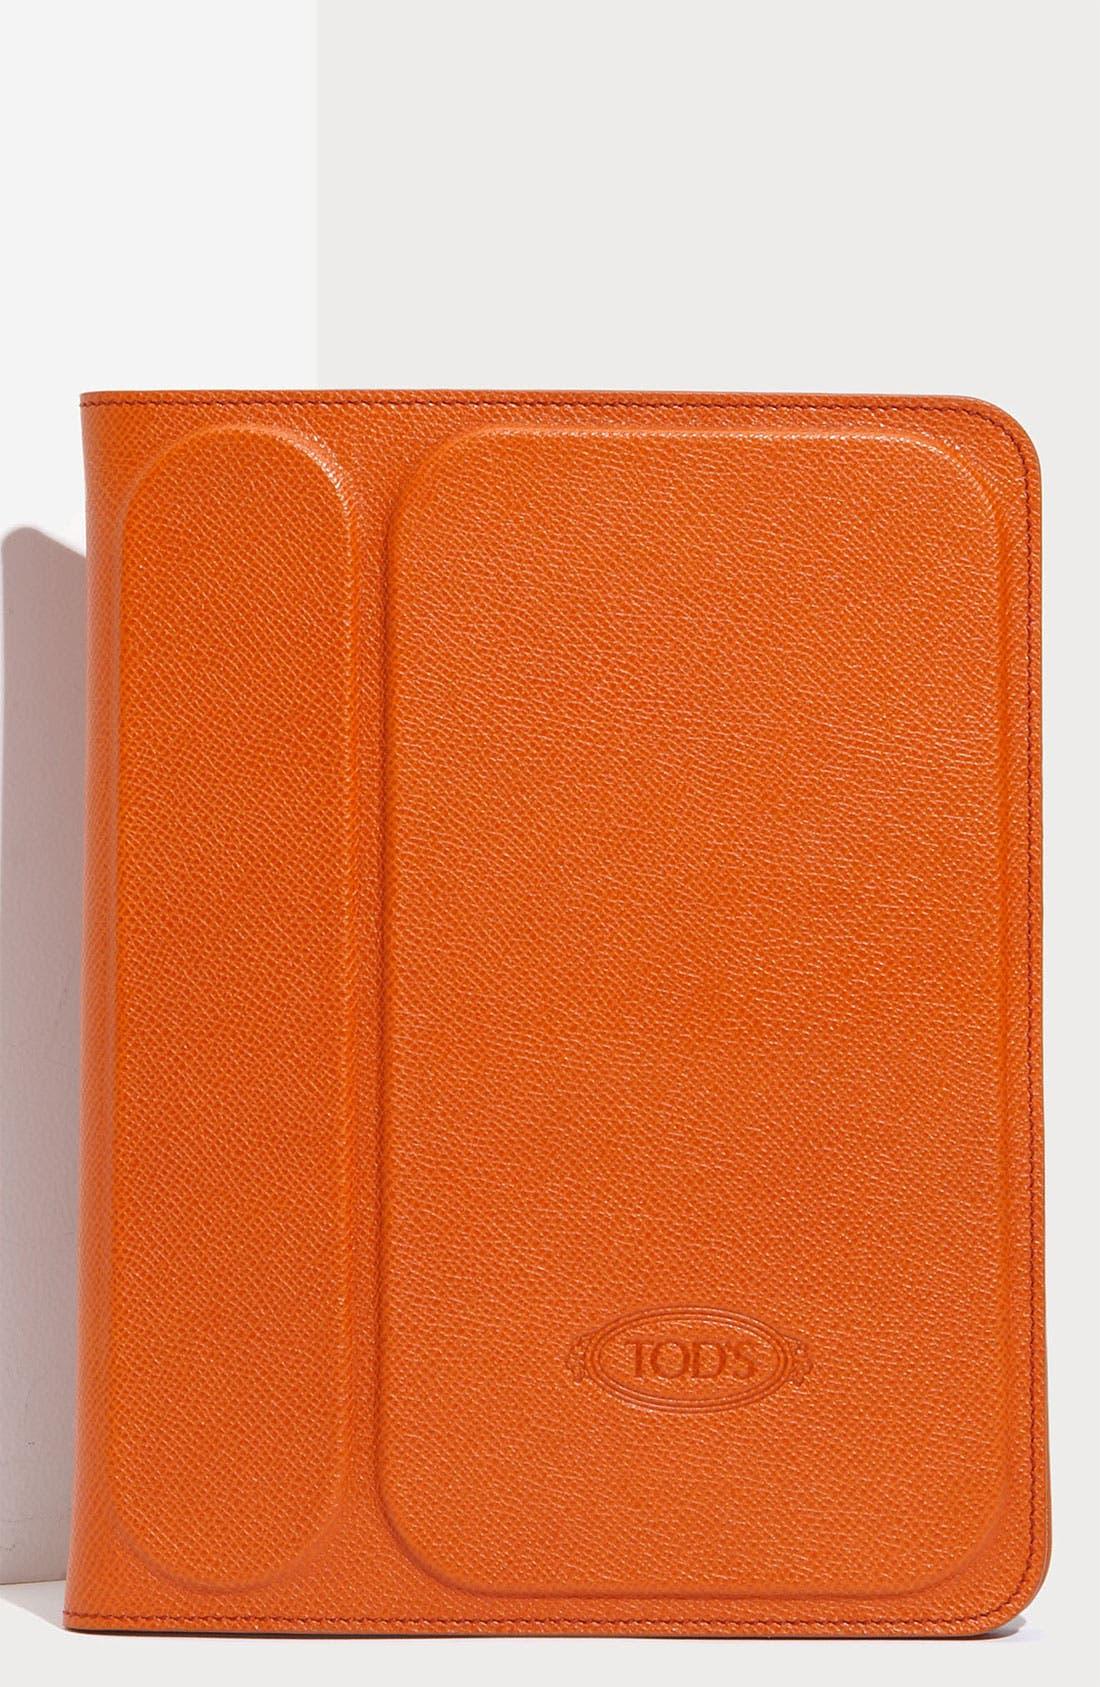 Main Image - Tod's Leather iPad 2 Case